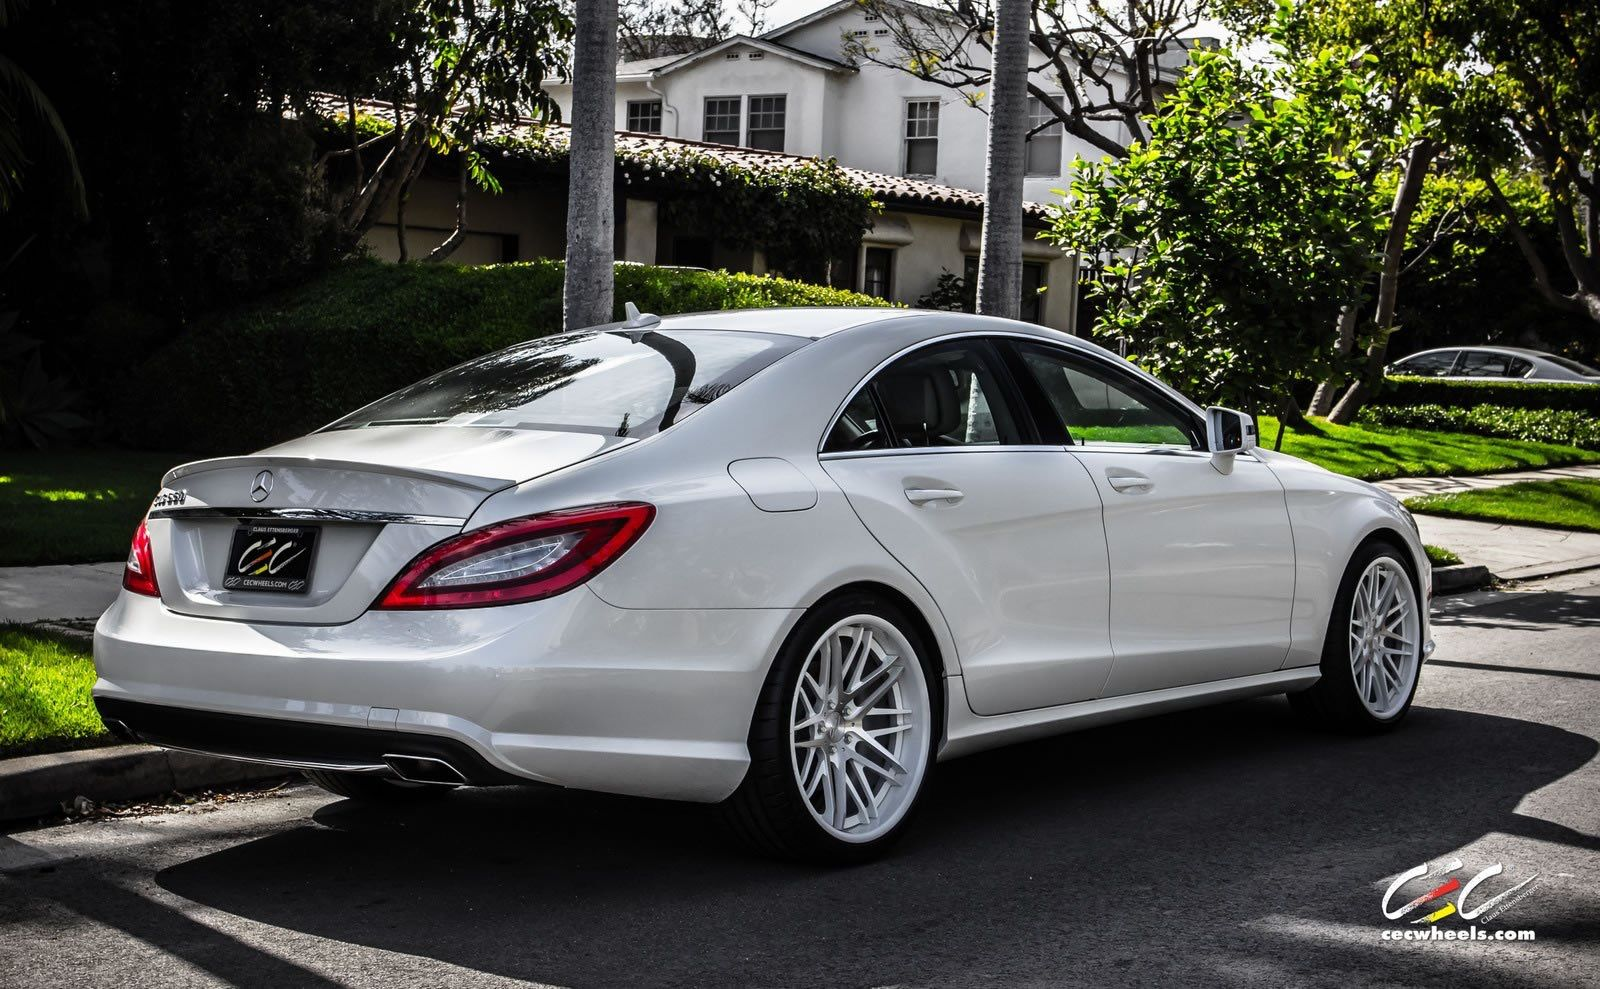 2015 Cls 550 Turning Heads Carros De Sonho Mercedes Carros